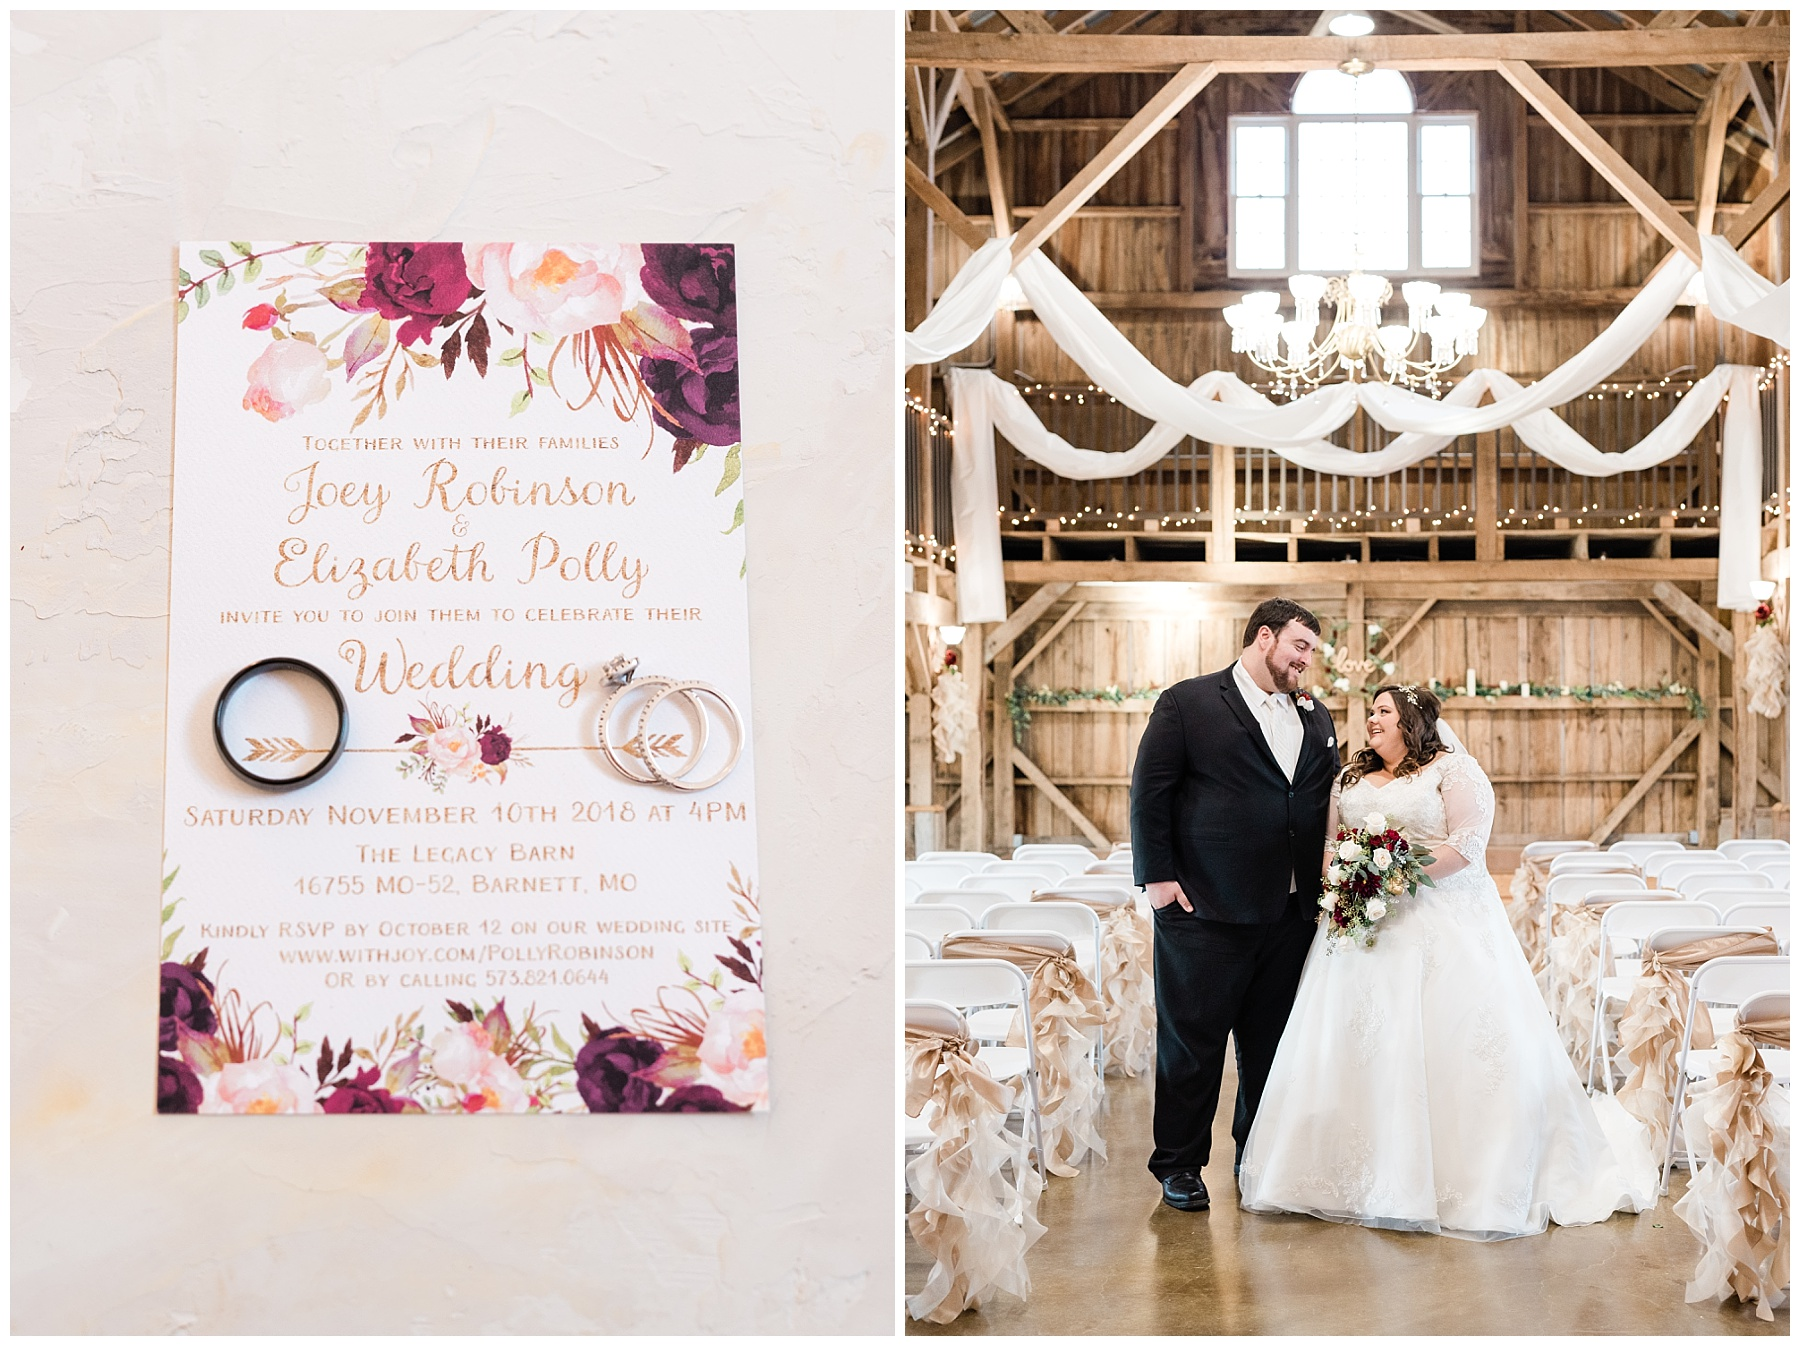 Golden Winter Wedding at The Legacy Barn in Barnett Missouri by Kelsi Kliethermes Photography Columbia Missouri Wedding Photographer_0026.jpg